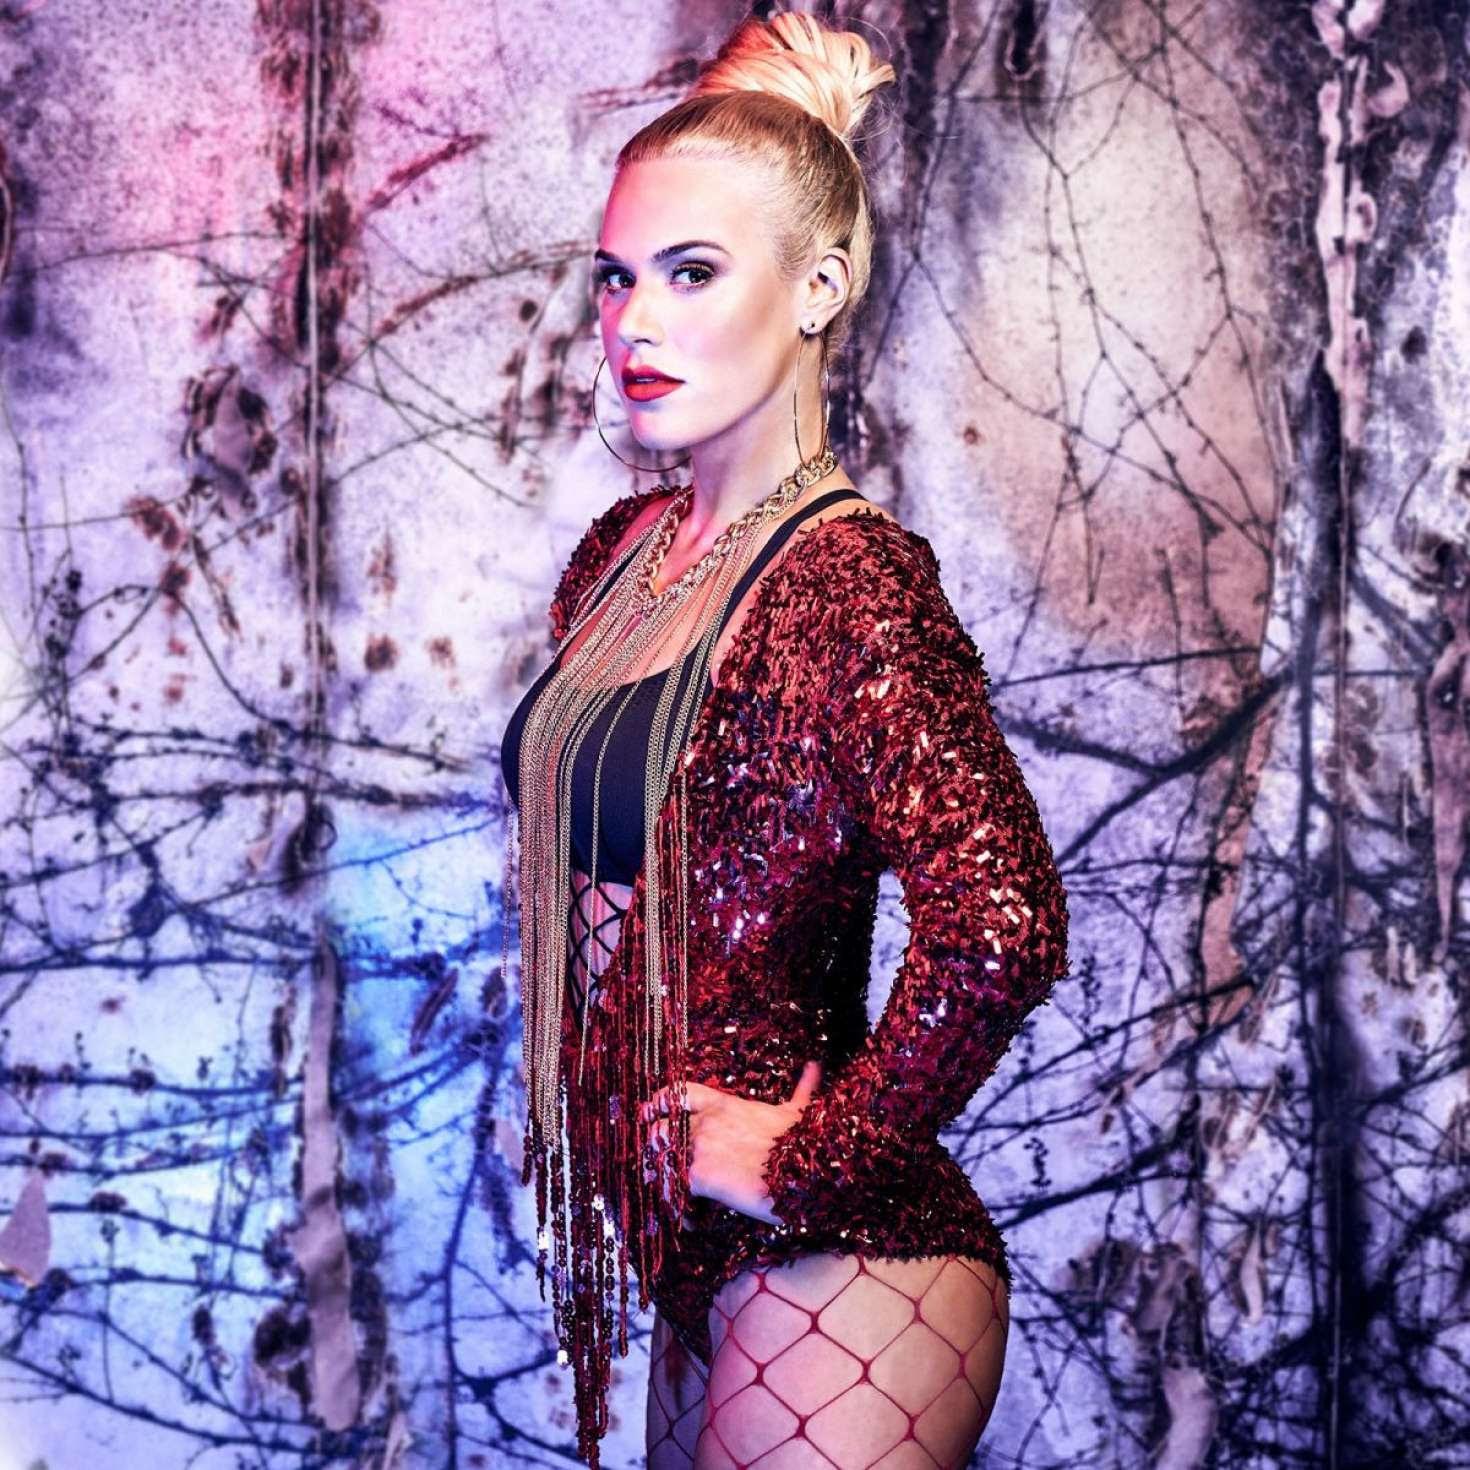 CJ Perry Lana – Halloween Photoshoot WWE Divas 2017